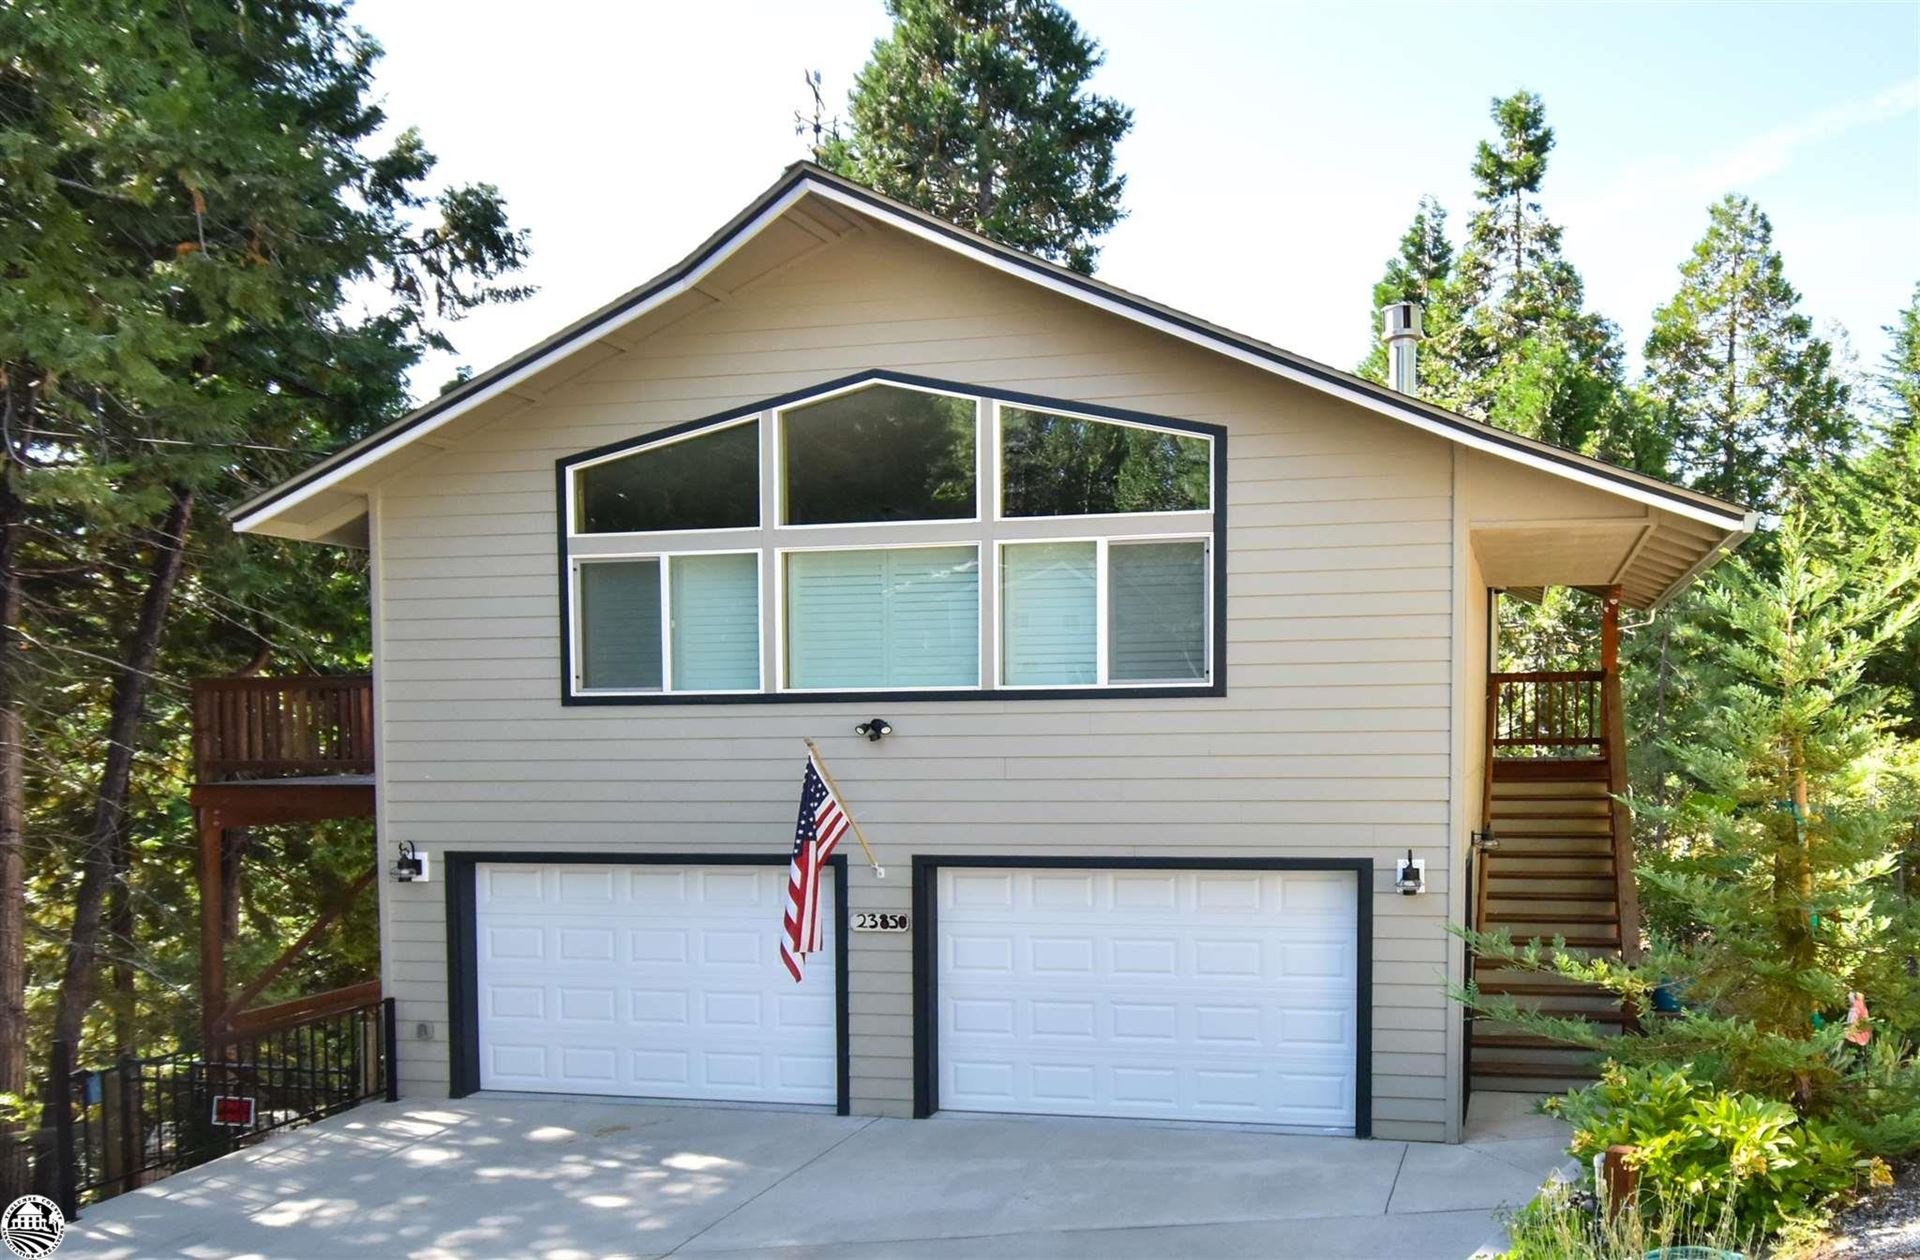 23850 Hilltop Circle Circle, Twain Harte, CA 95383 - MLS#: 20201294